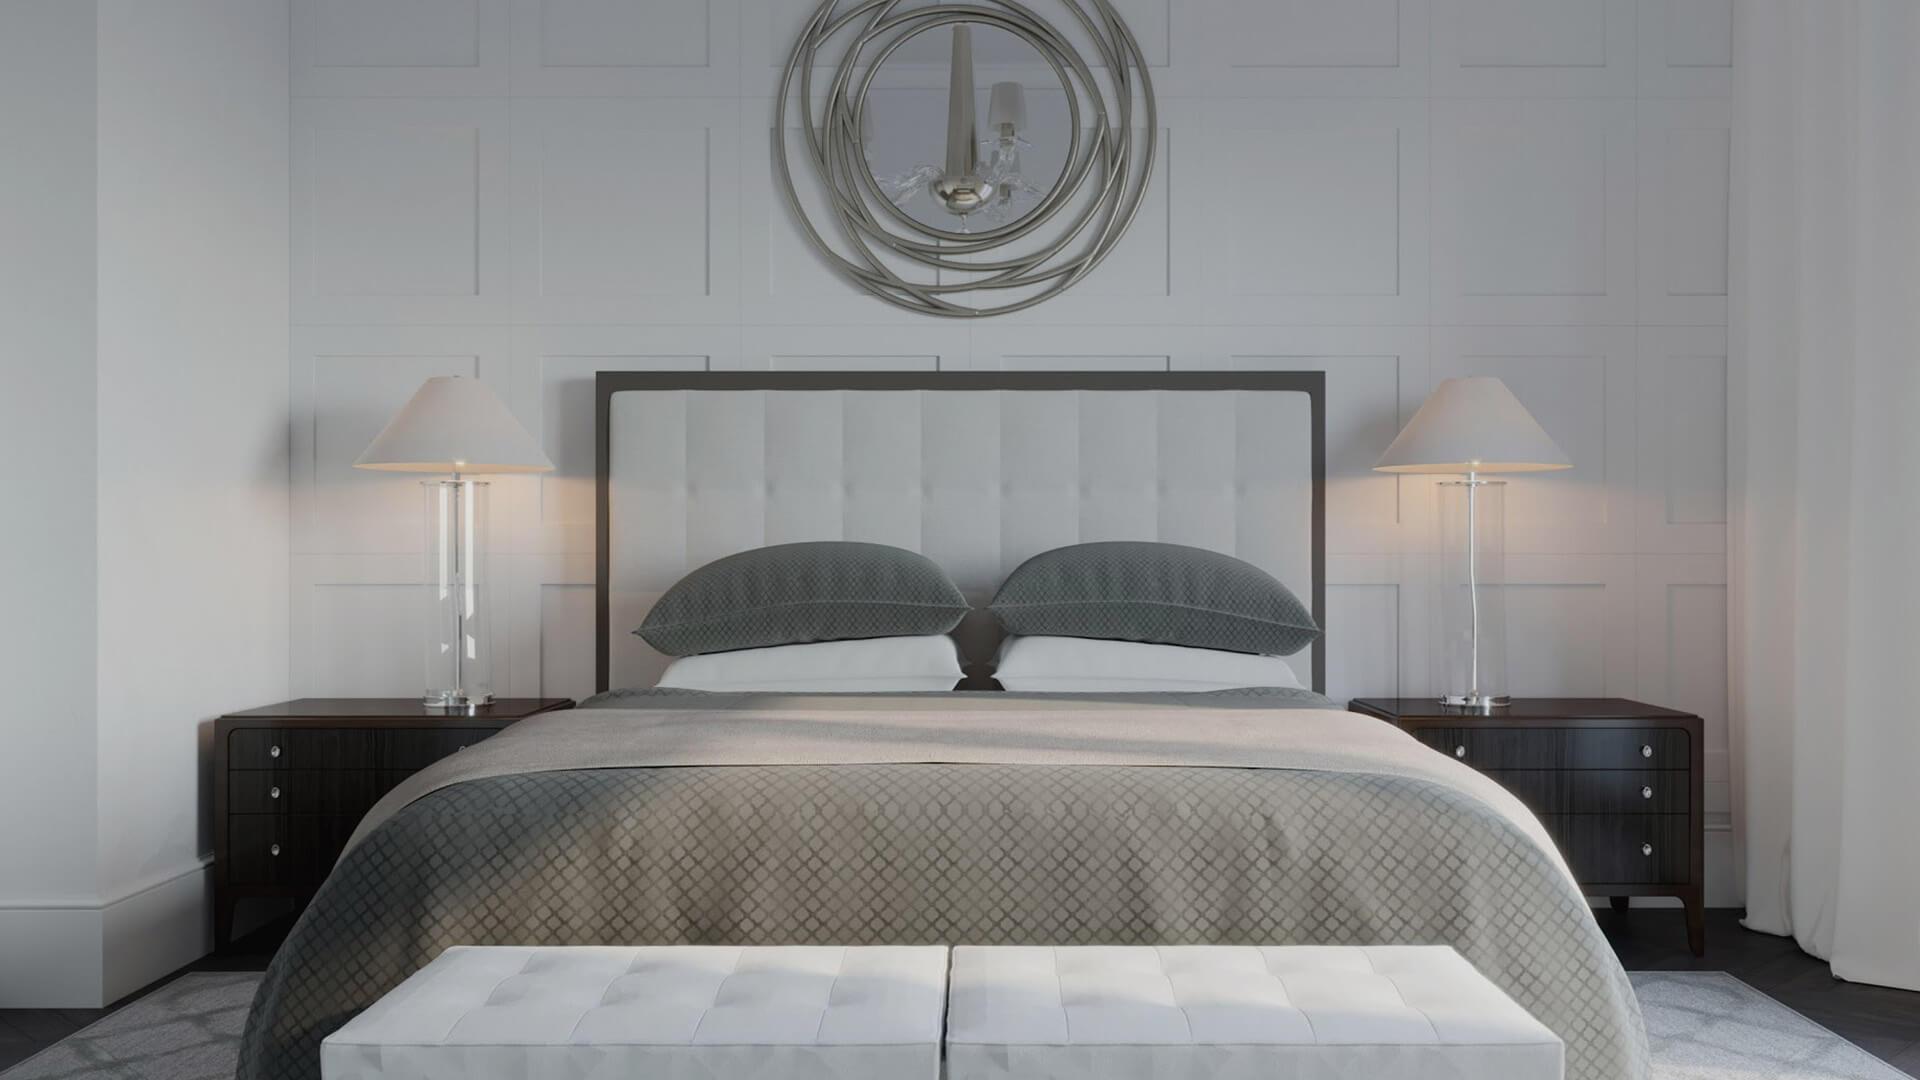 Интерьер спальни, вариант 1